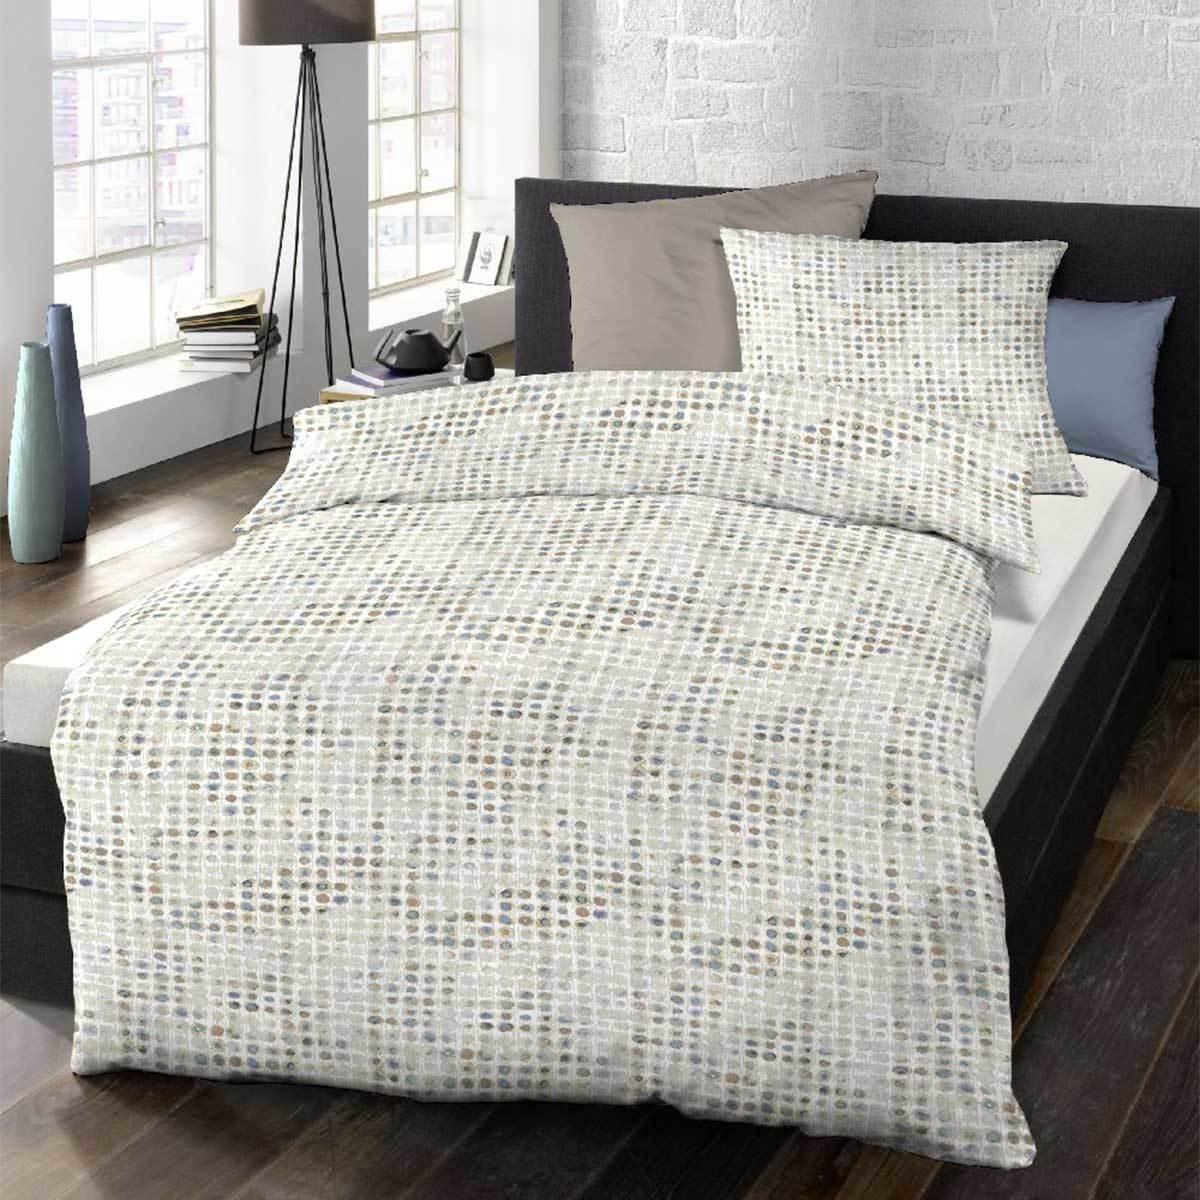 schlafgut soft touch cotton bettw sche prisella pinacolada. Black Bedroom Furniture Sets. Home Design Ideas